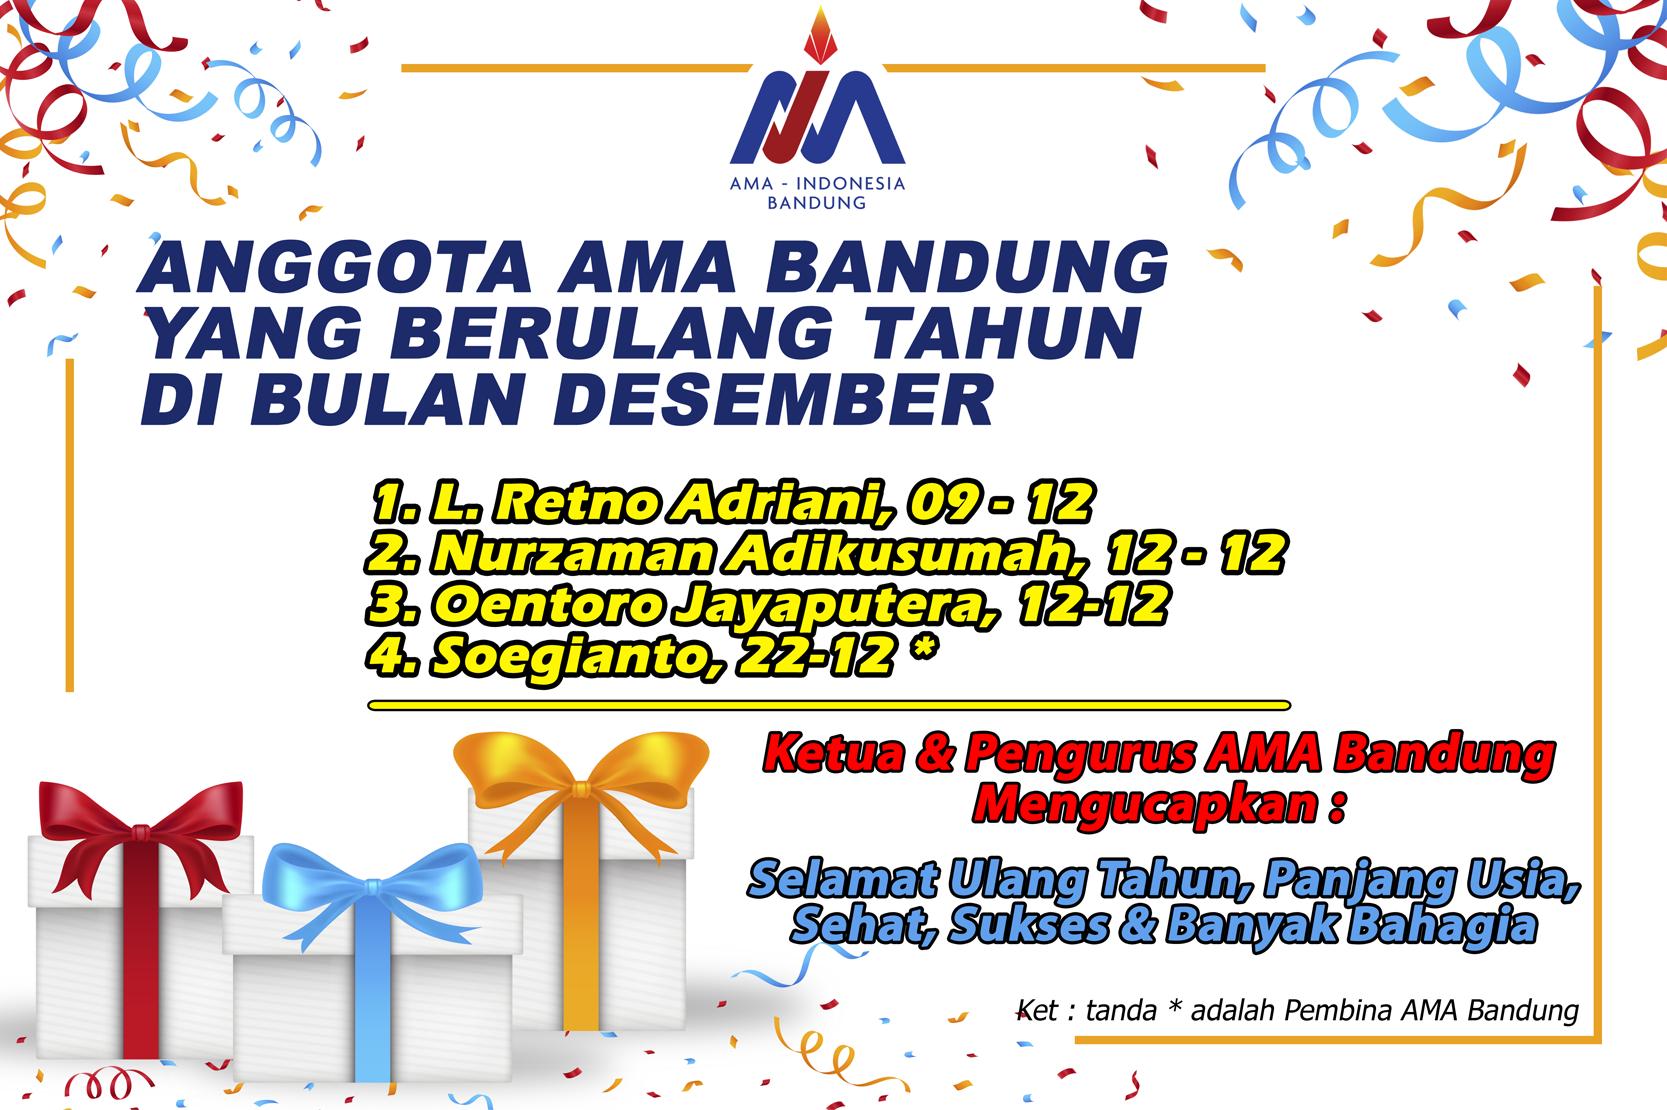 Anggota AMA Bandung yang Berulang tahun bulan Desember